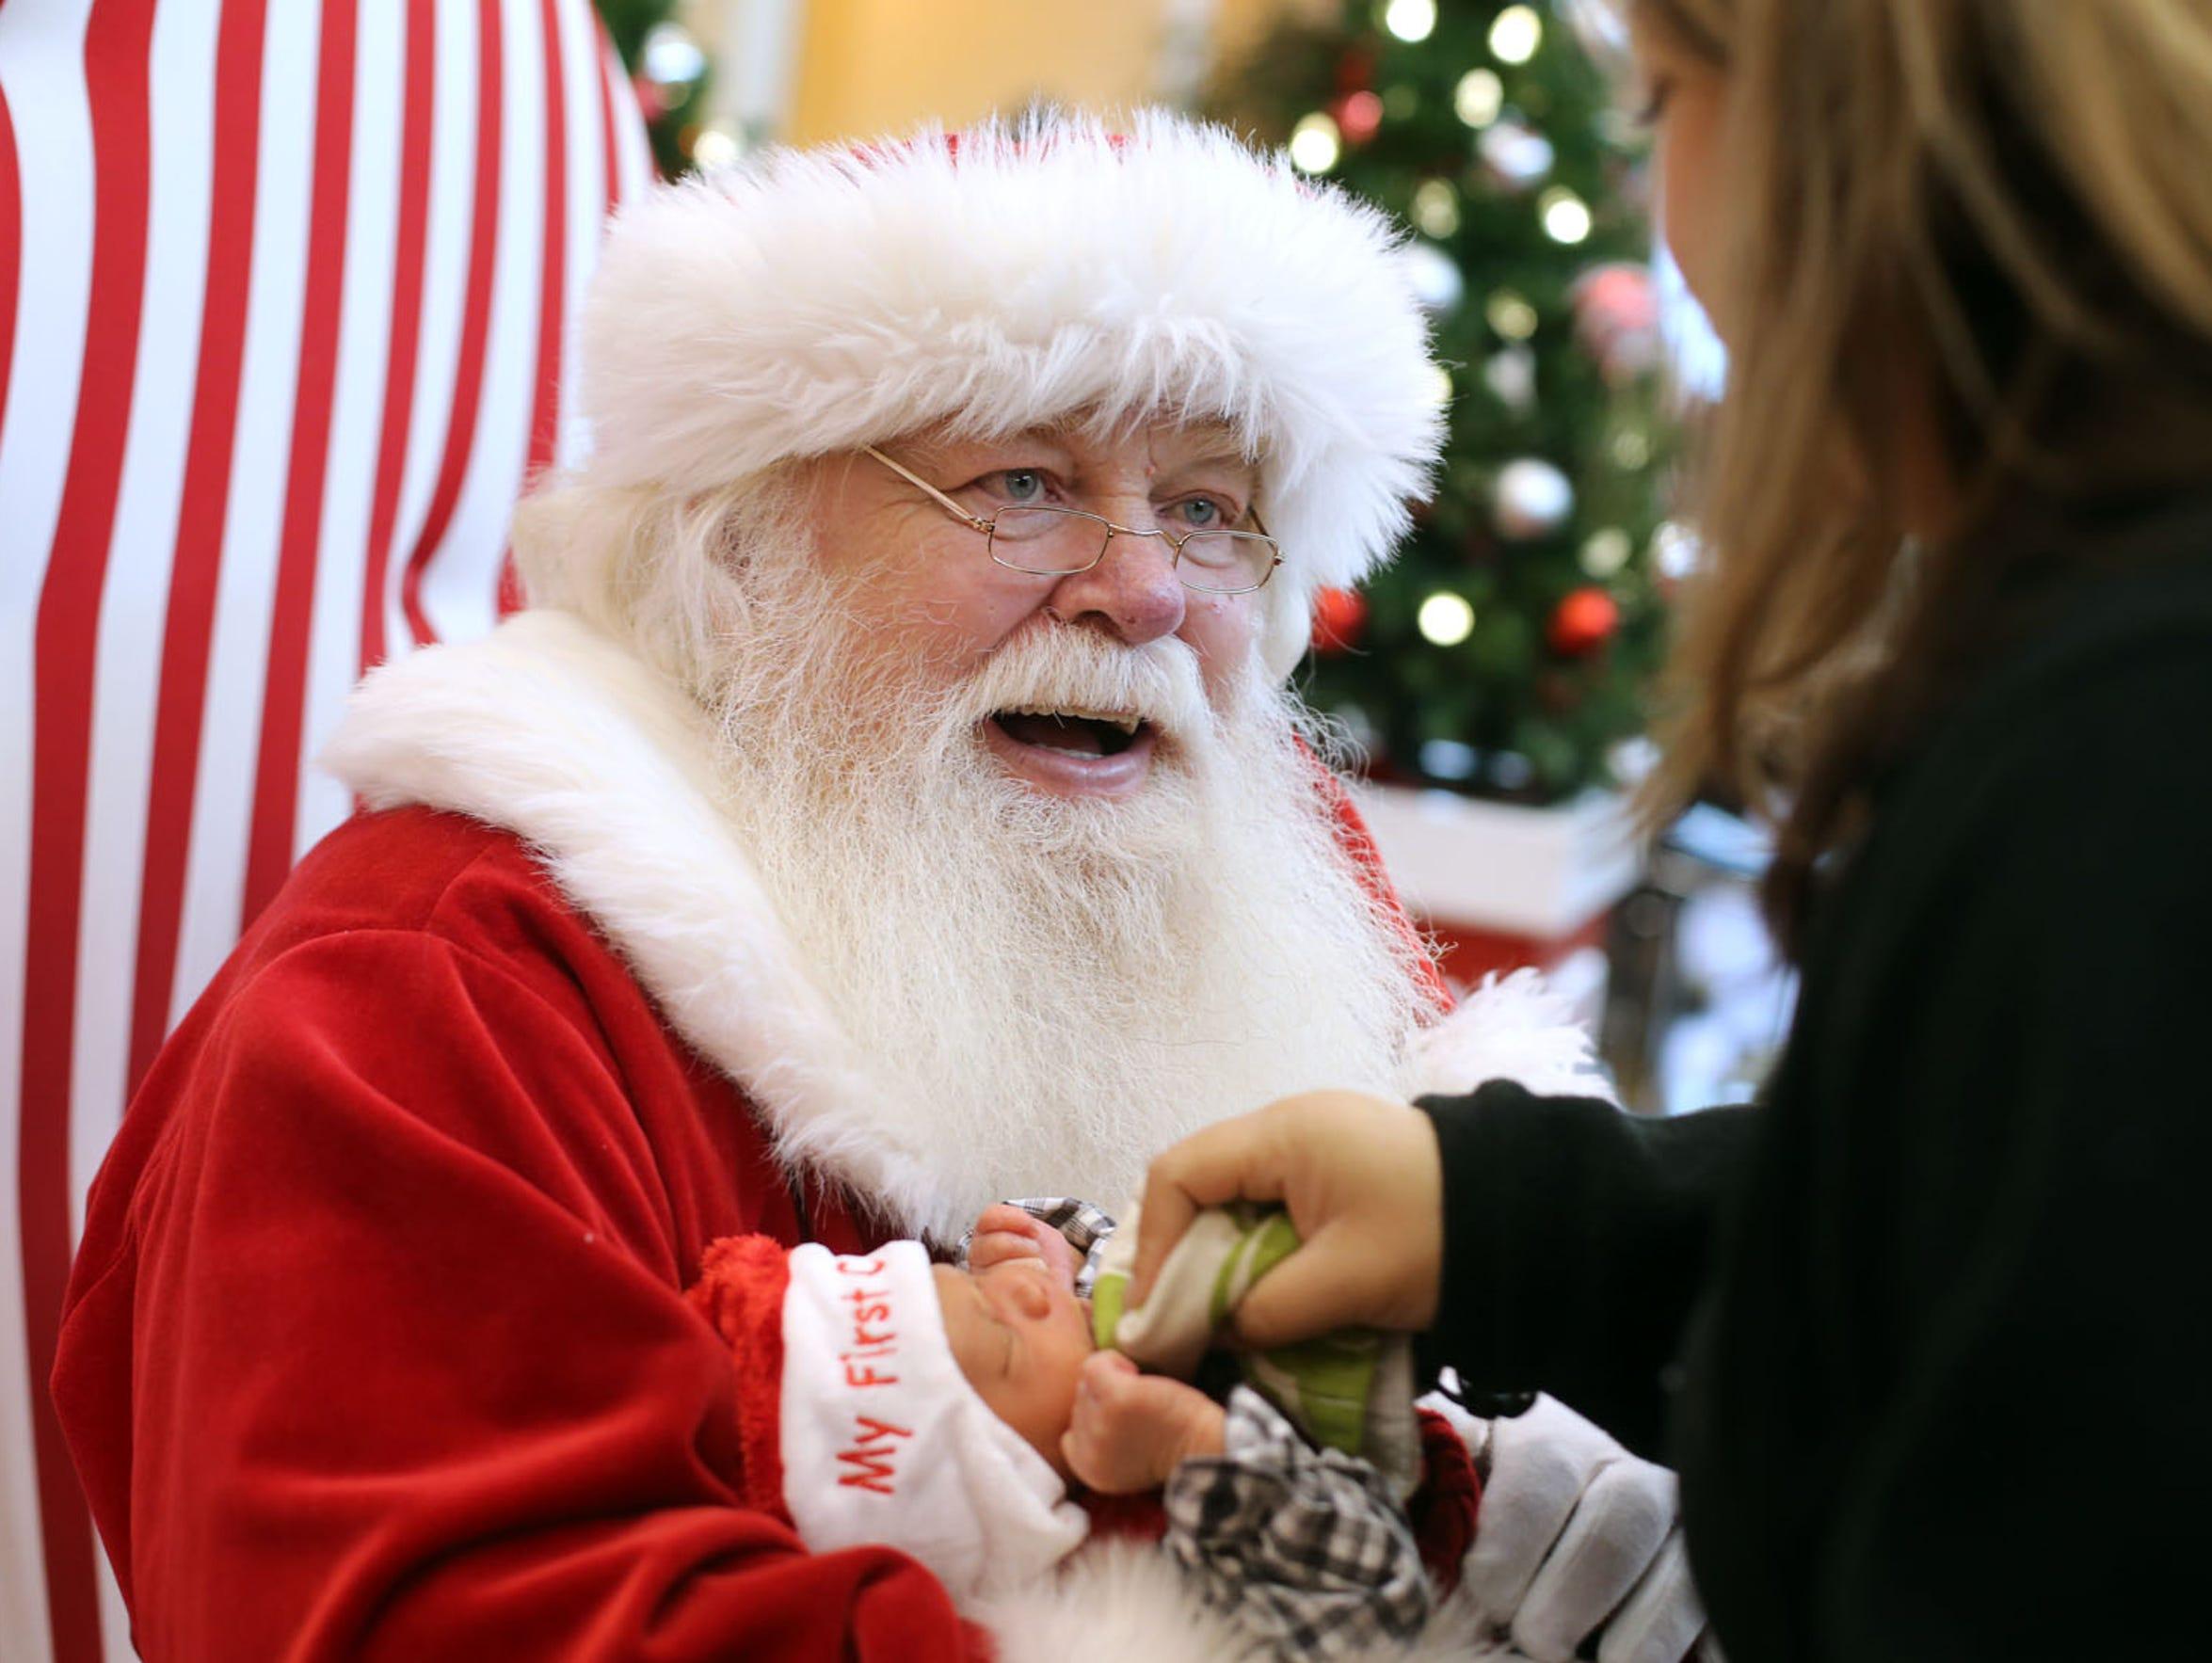 Santa will arrive at Stones River Mall on Saturday.